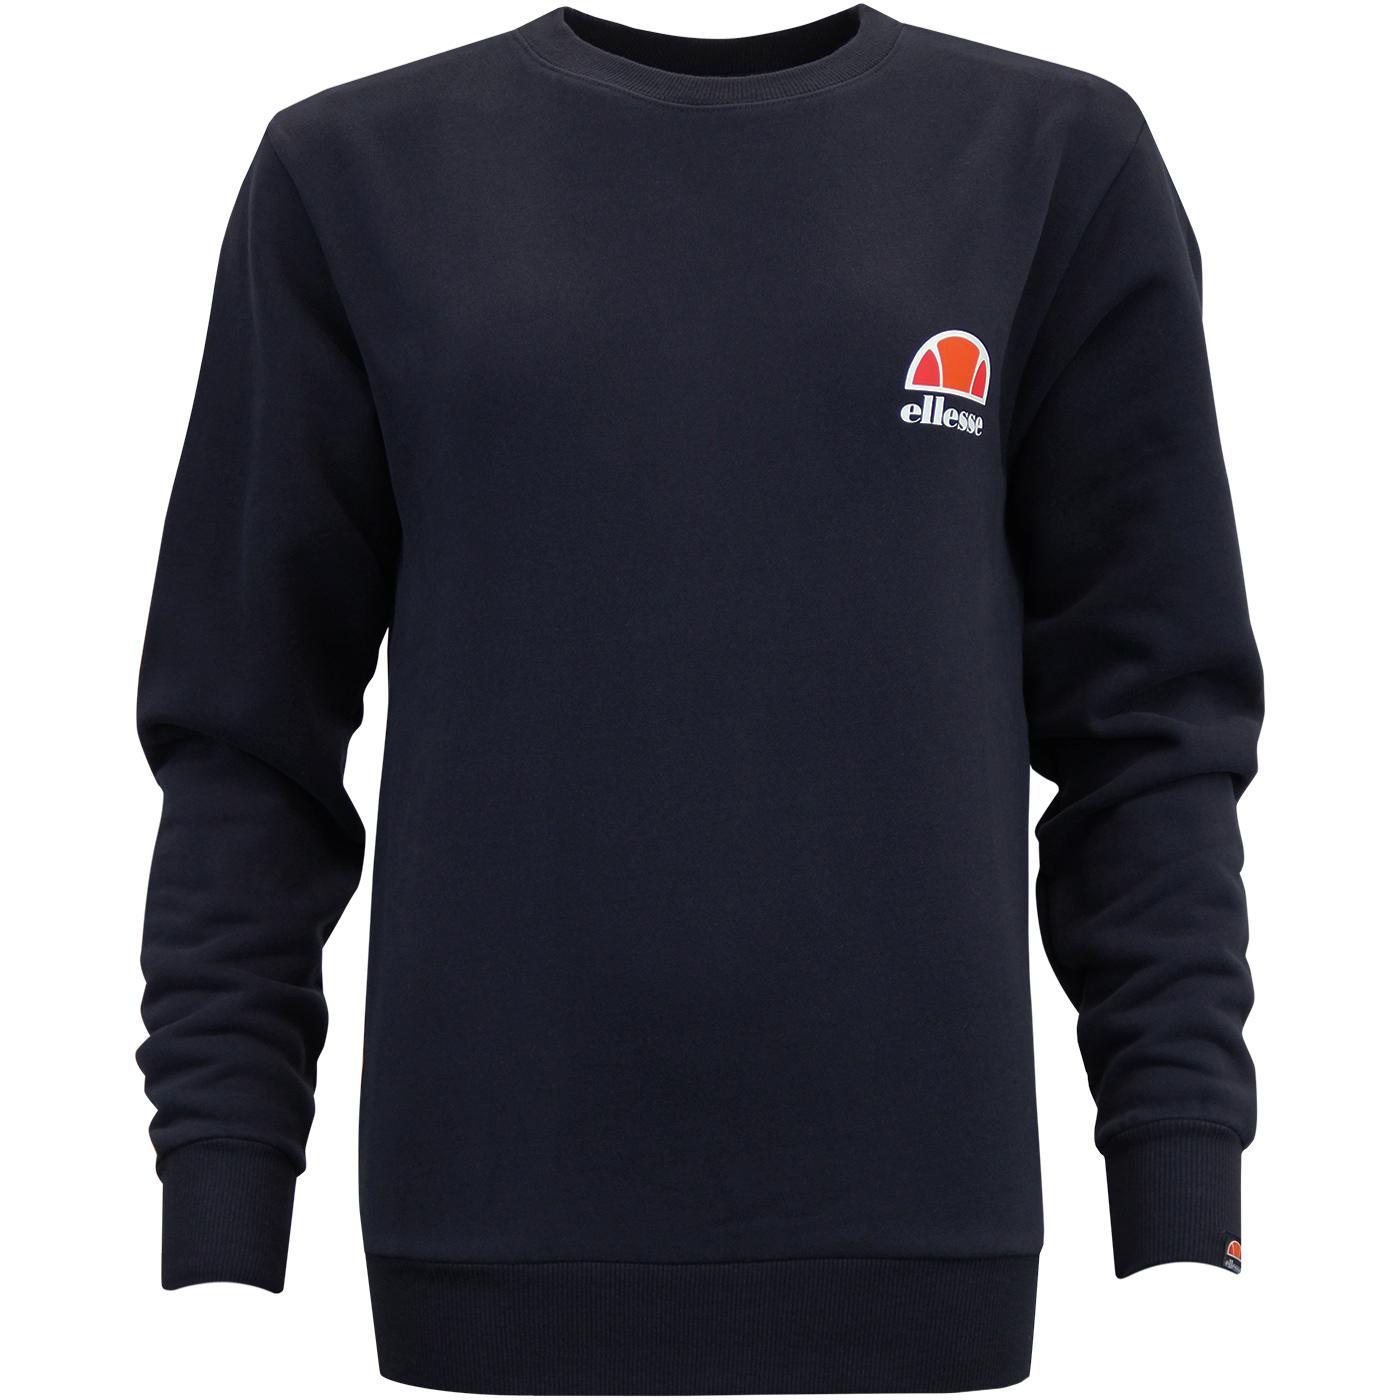 Haverford ELLESSE Womens Basic Retro Sweatshirt N